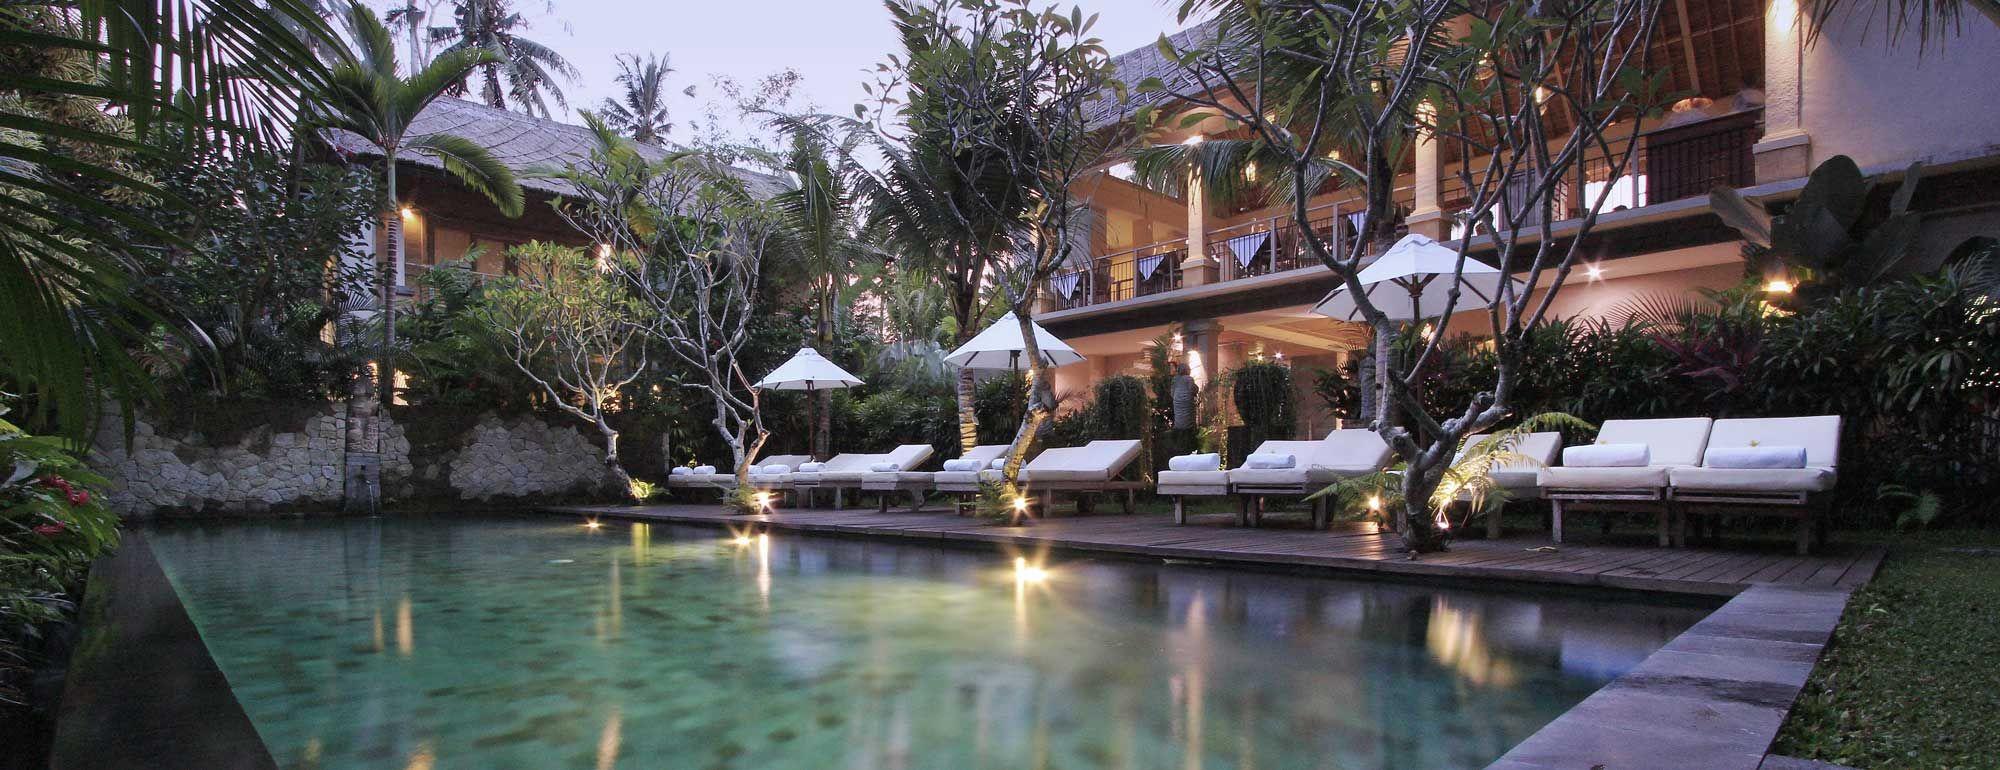 puri sunia resort ubud bali pool view casas de playa ubud ubud rh pinterest com au